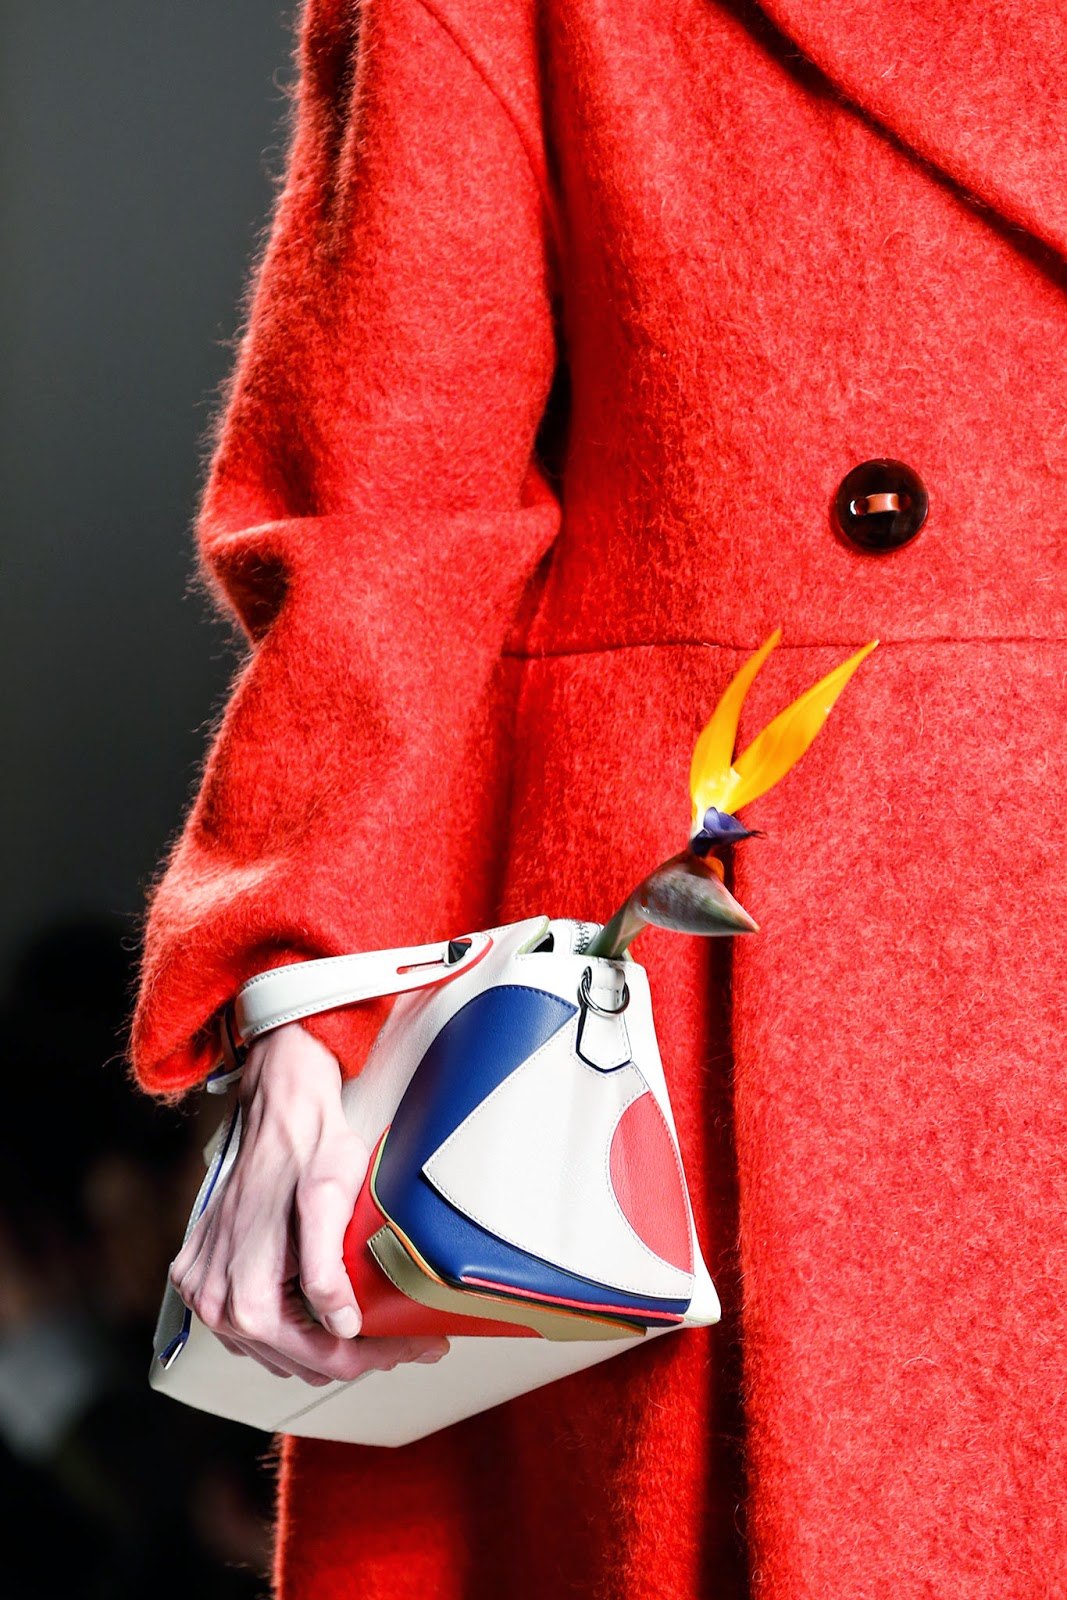 #MFW: Fendi Fall/Winter 15 Bags Report